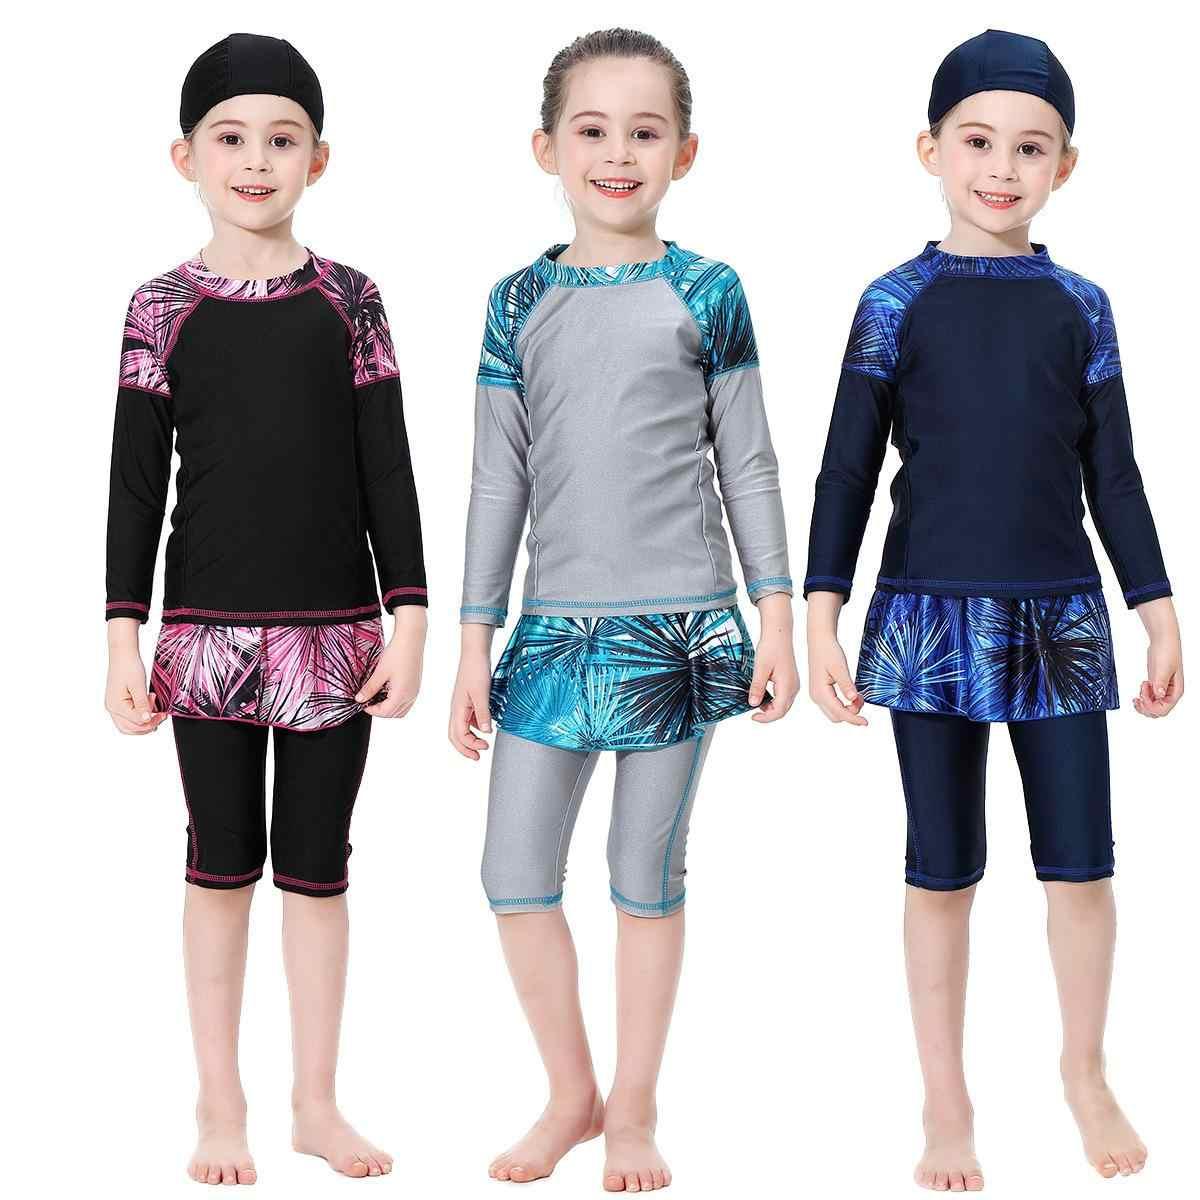 Girls Swimwear Kids Modest Full Cover Muslim Islamic Long Sleeve Swim Beachwear